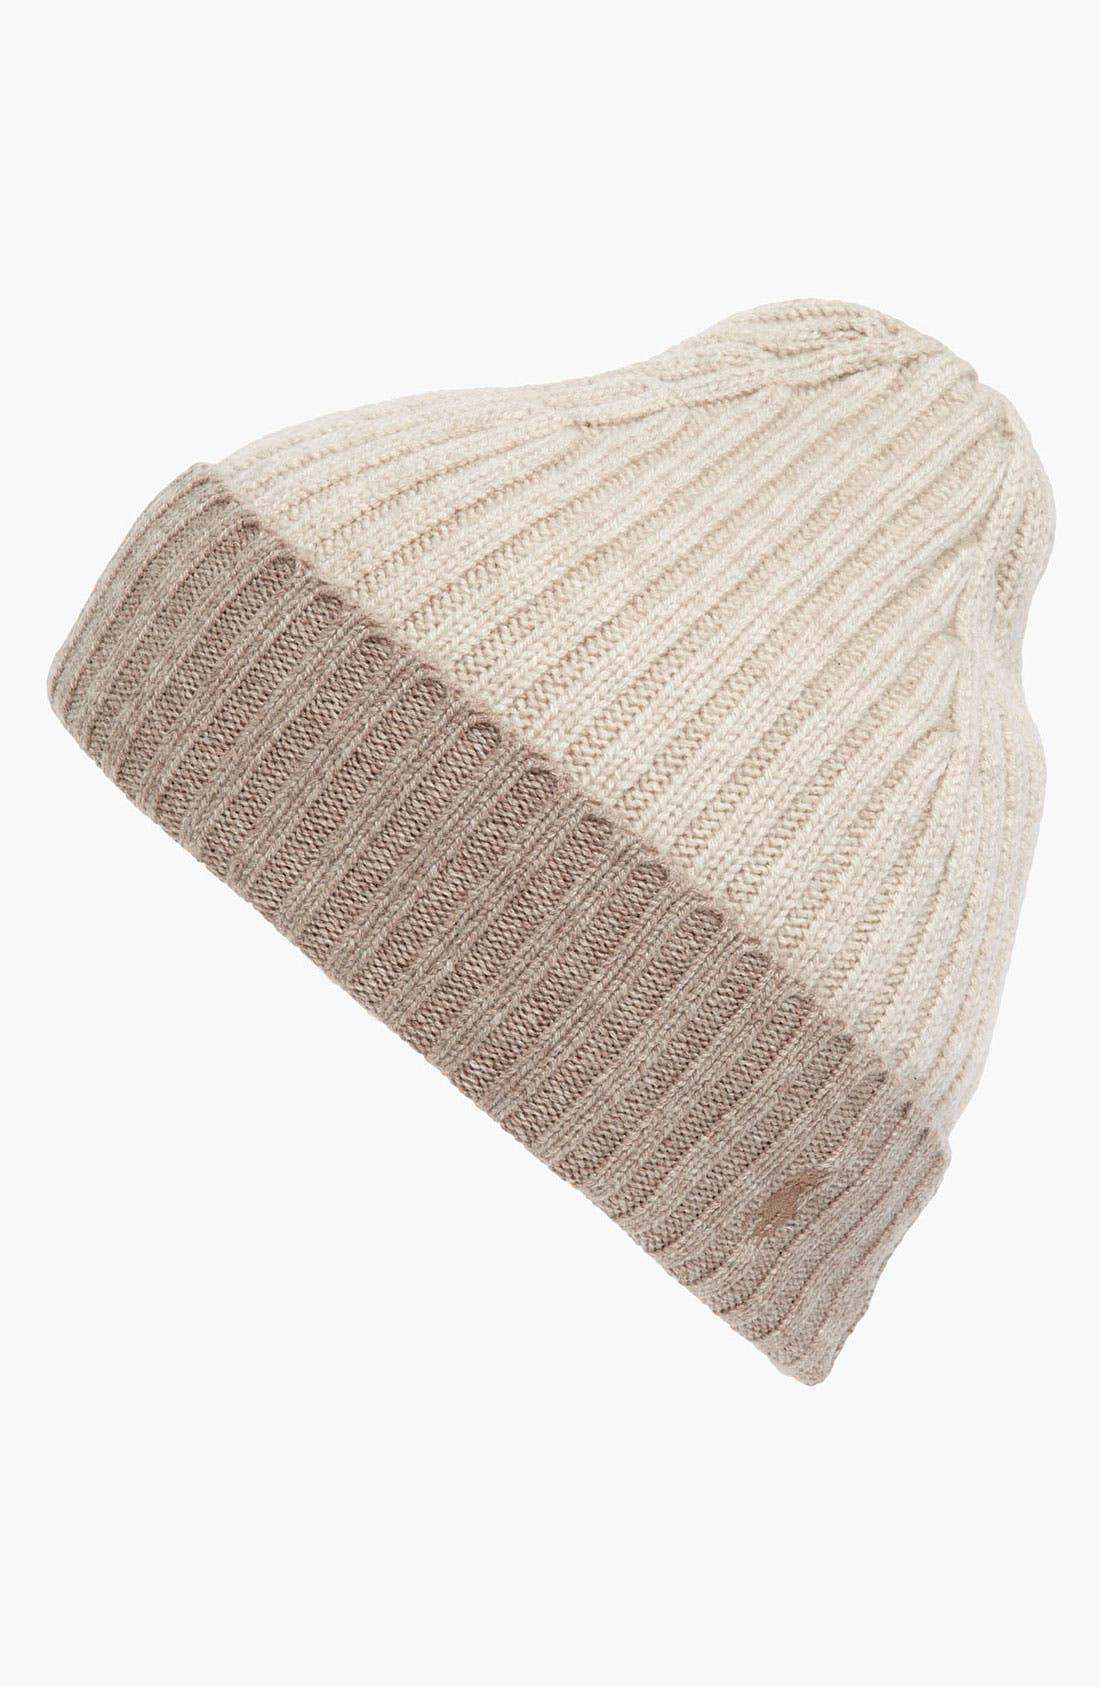 Alternate Image 1 Selected - Polo Ralph Lauren Wool Blend Knit Cap